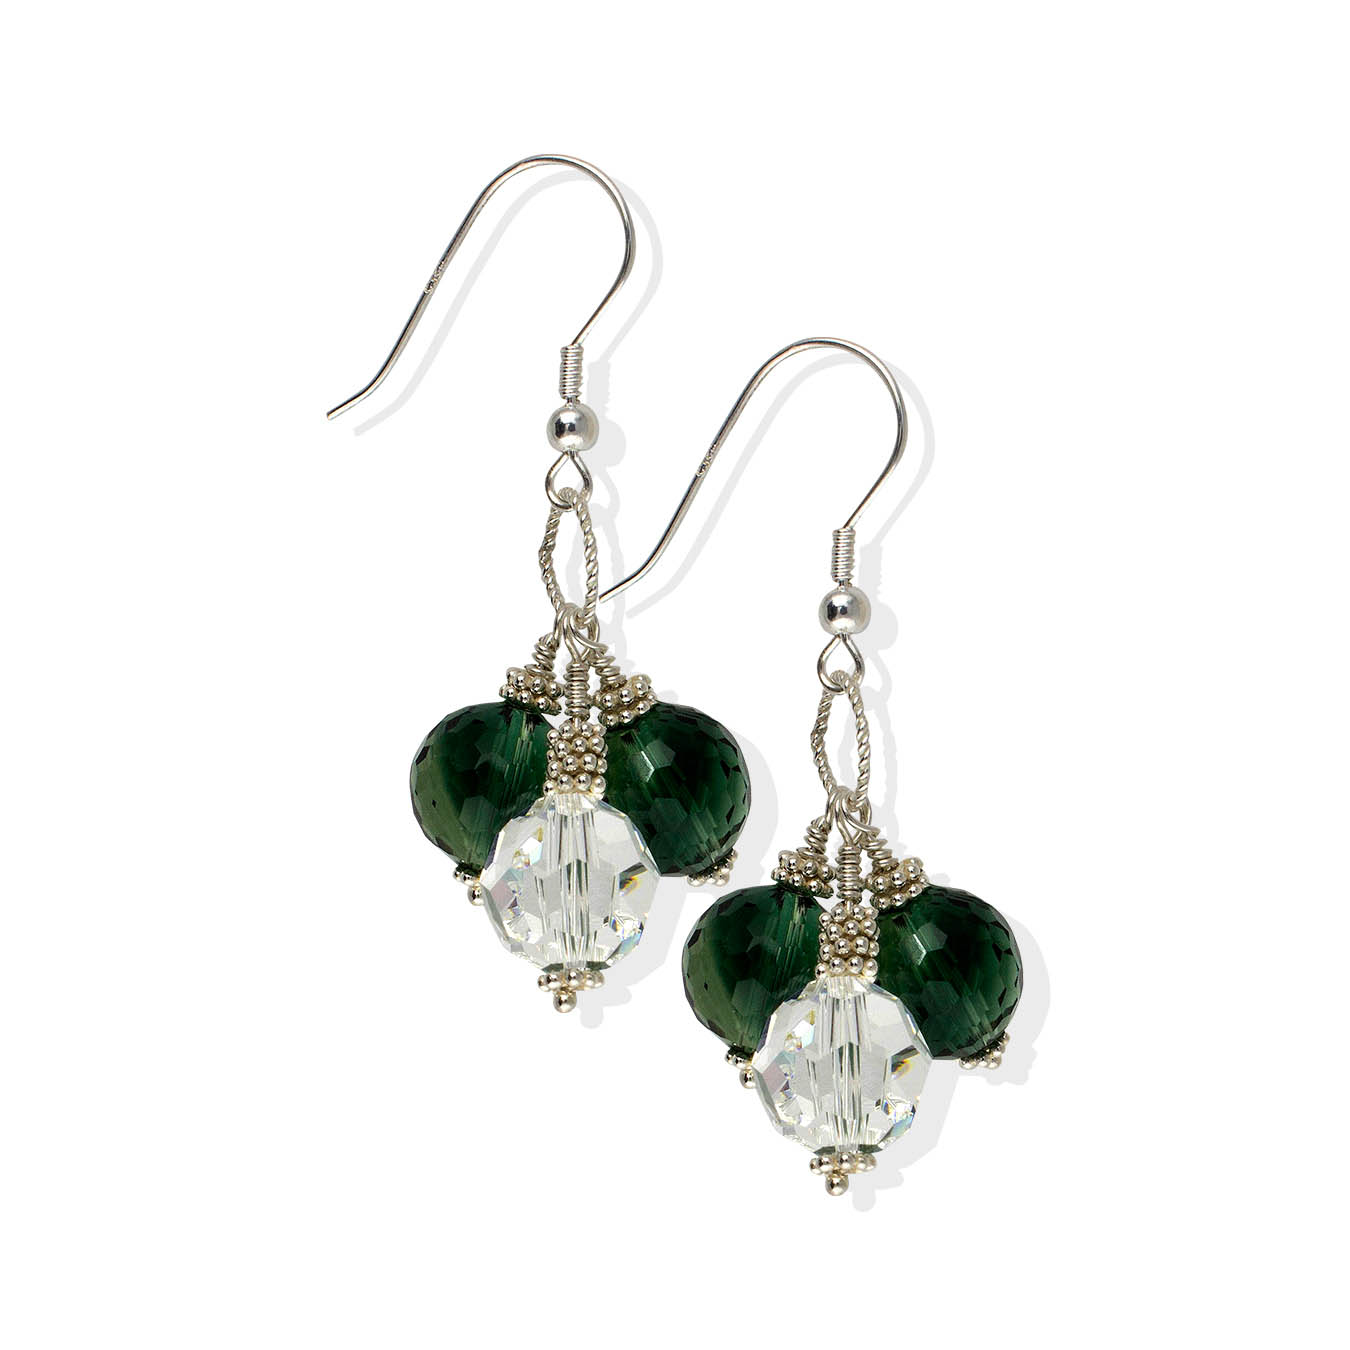 Handcrafted pendant style green quartz and swarovski bead jewelry